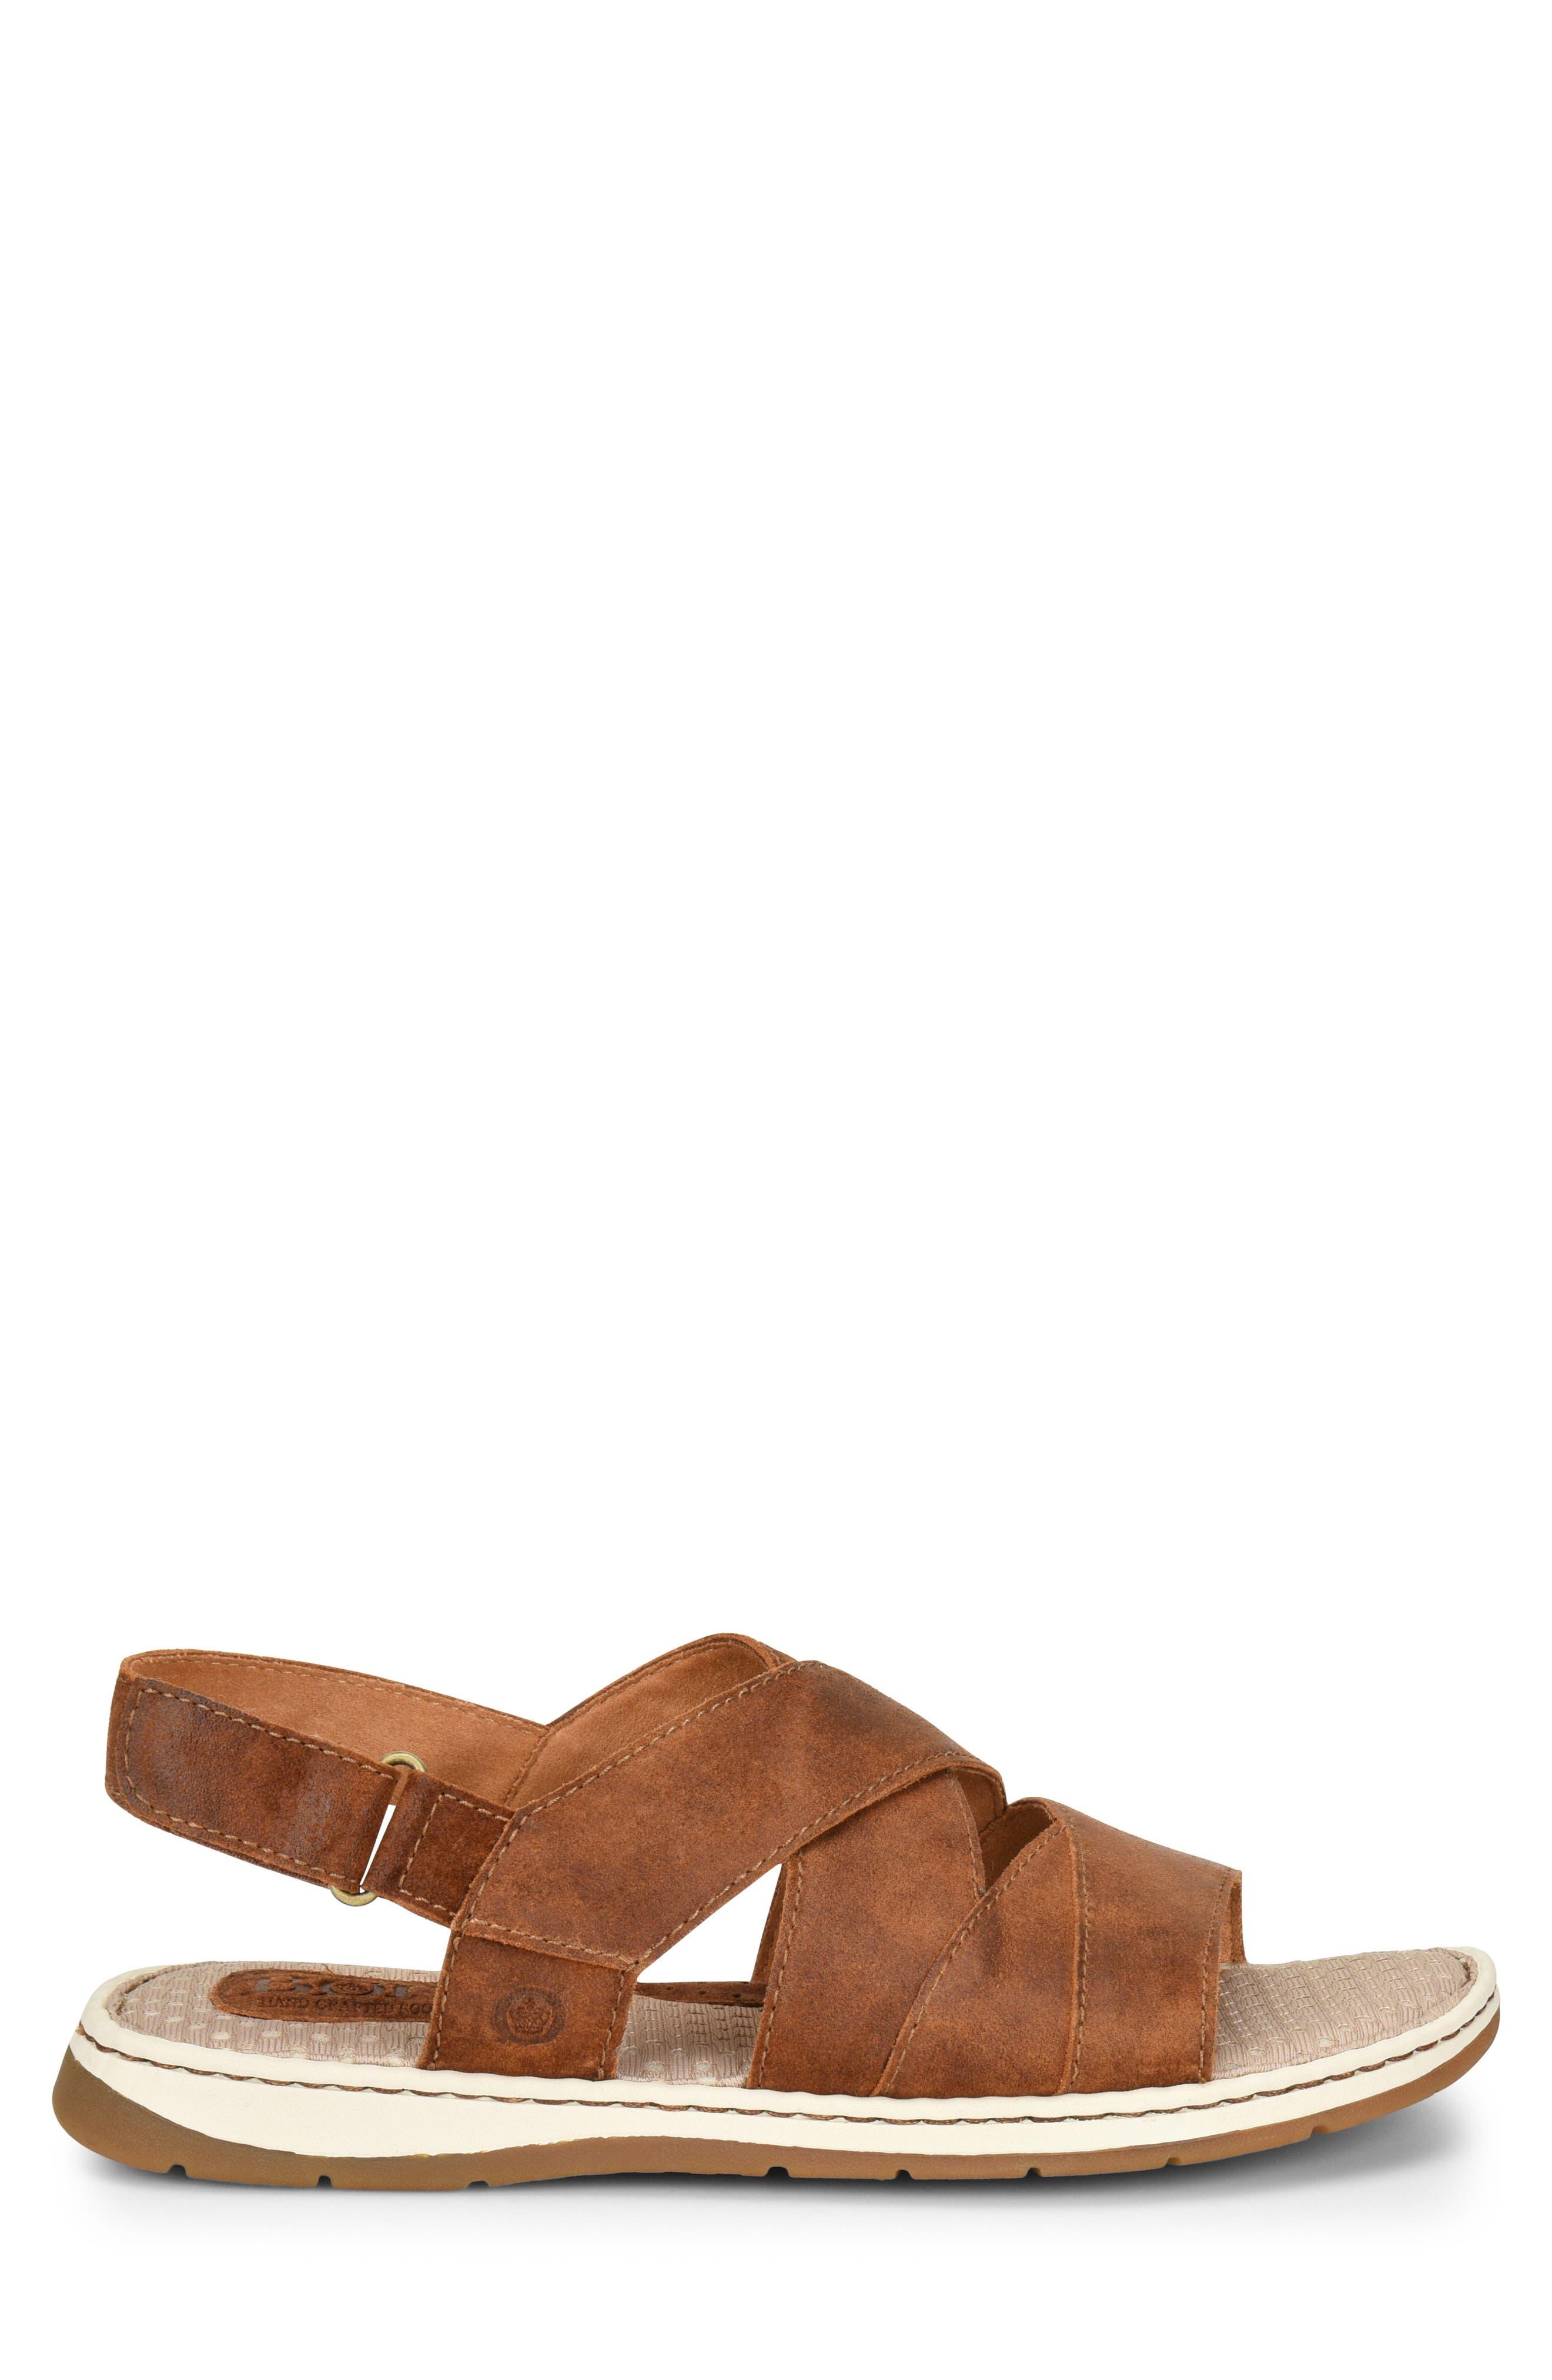 Shell Cross Strap Sandal,                             Alternate thumbnail 3, color,                             Rust Leather